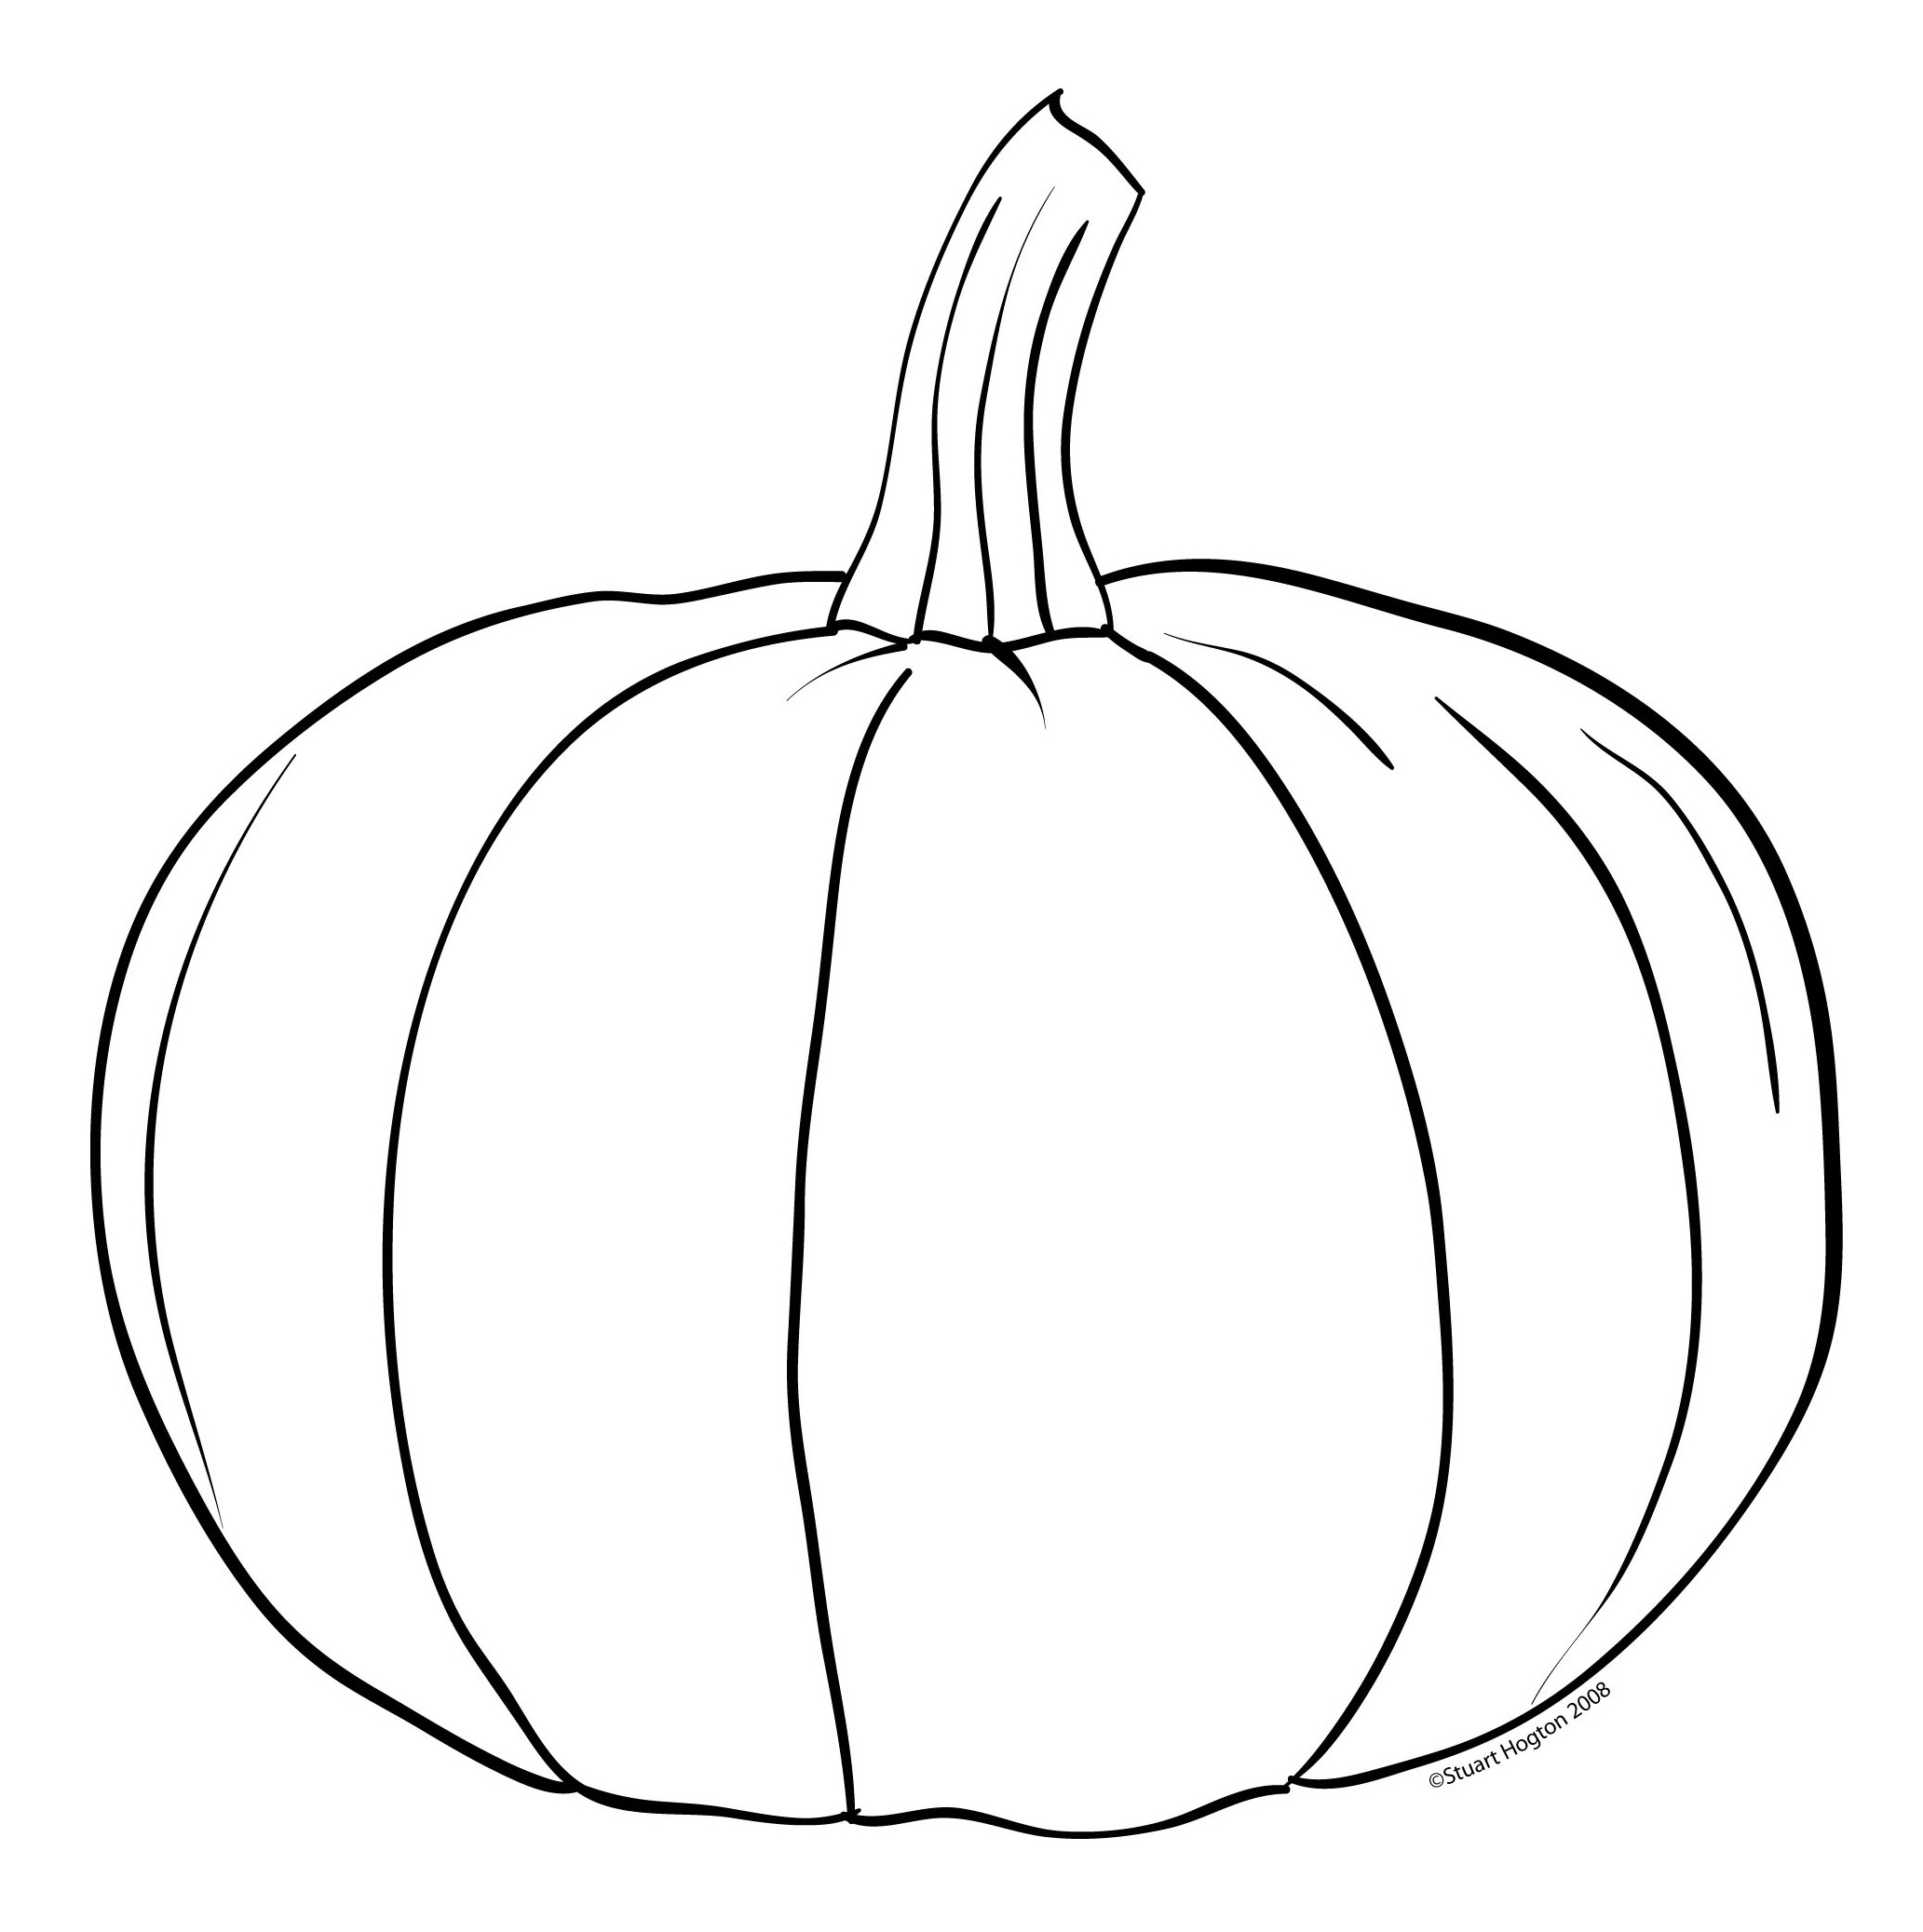 Pumpkin clipart drawing. Free line art download